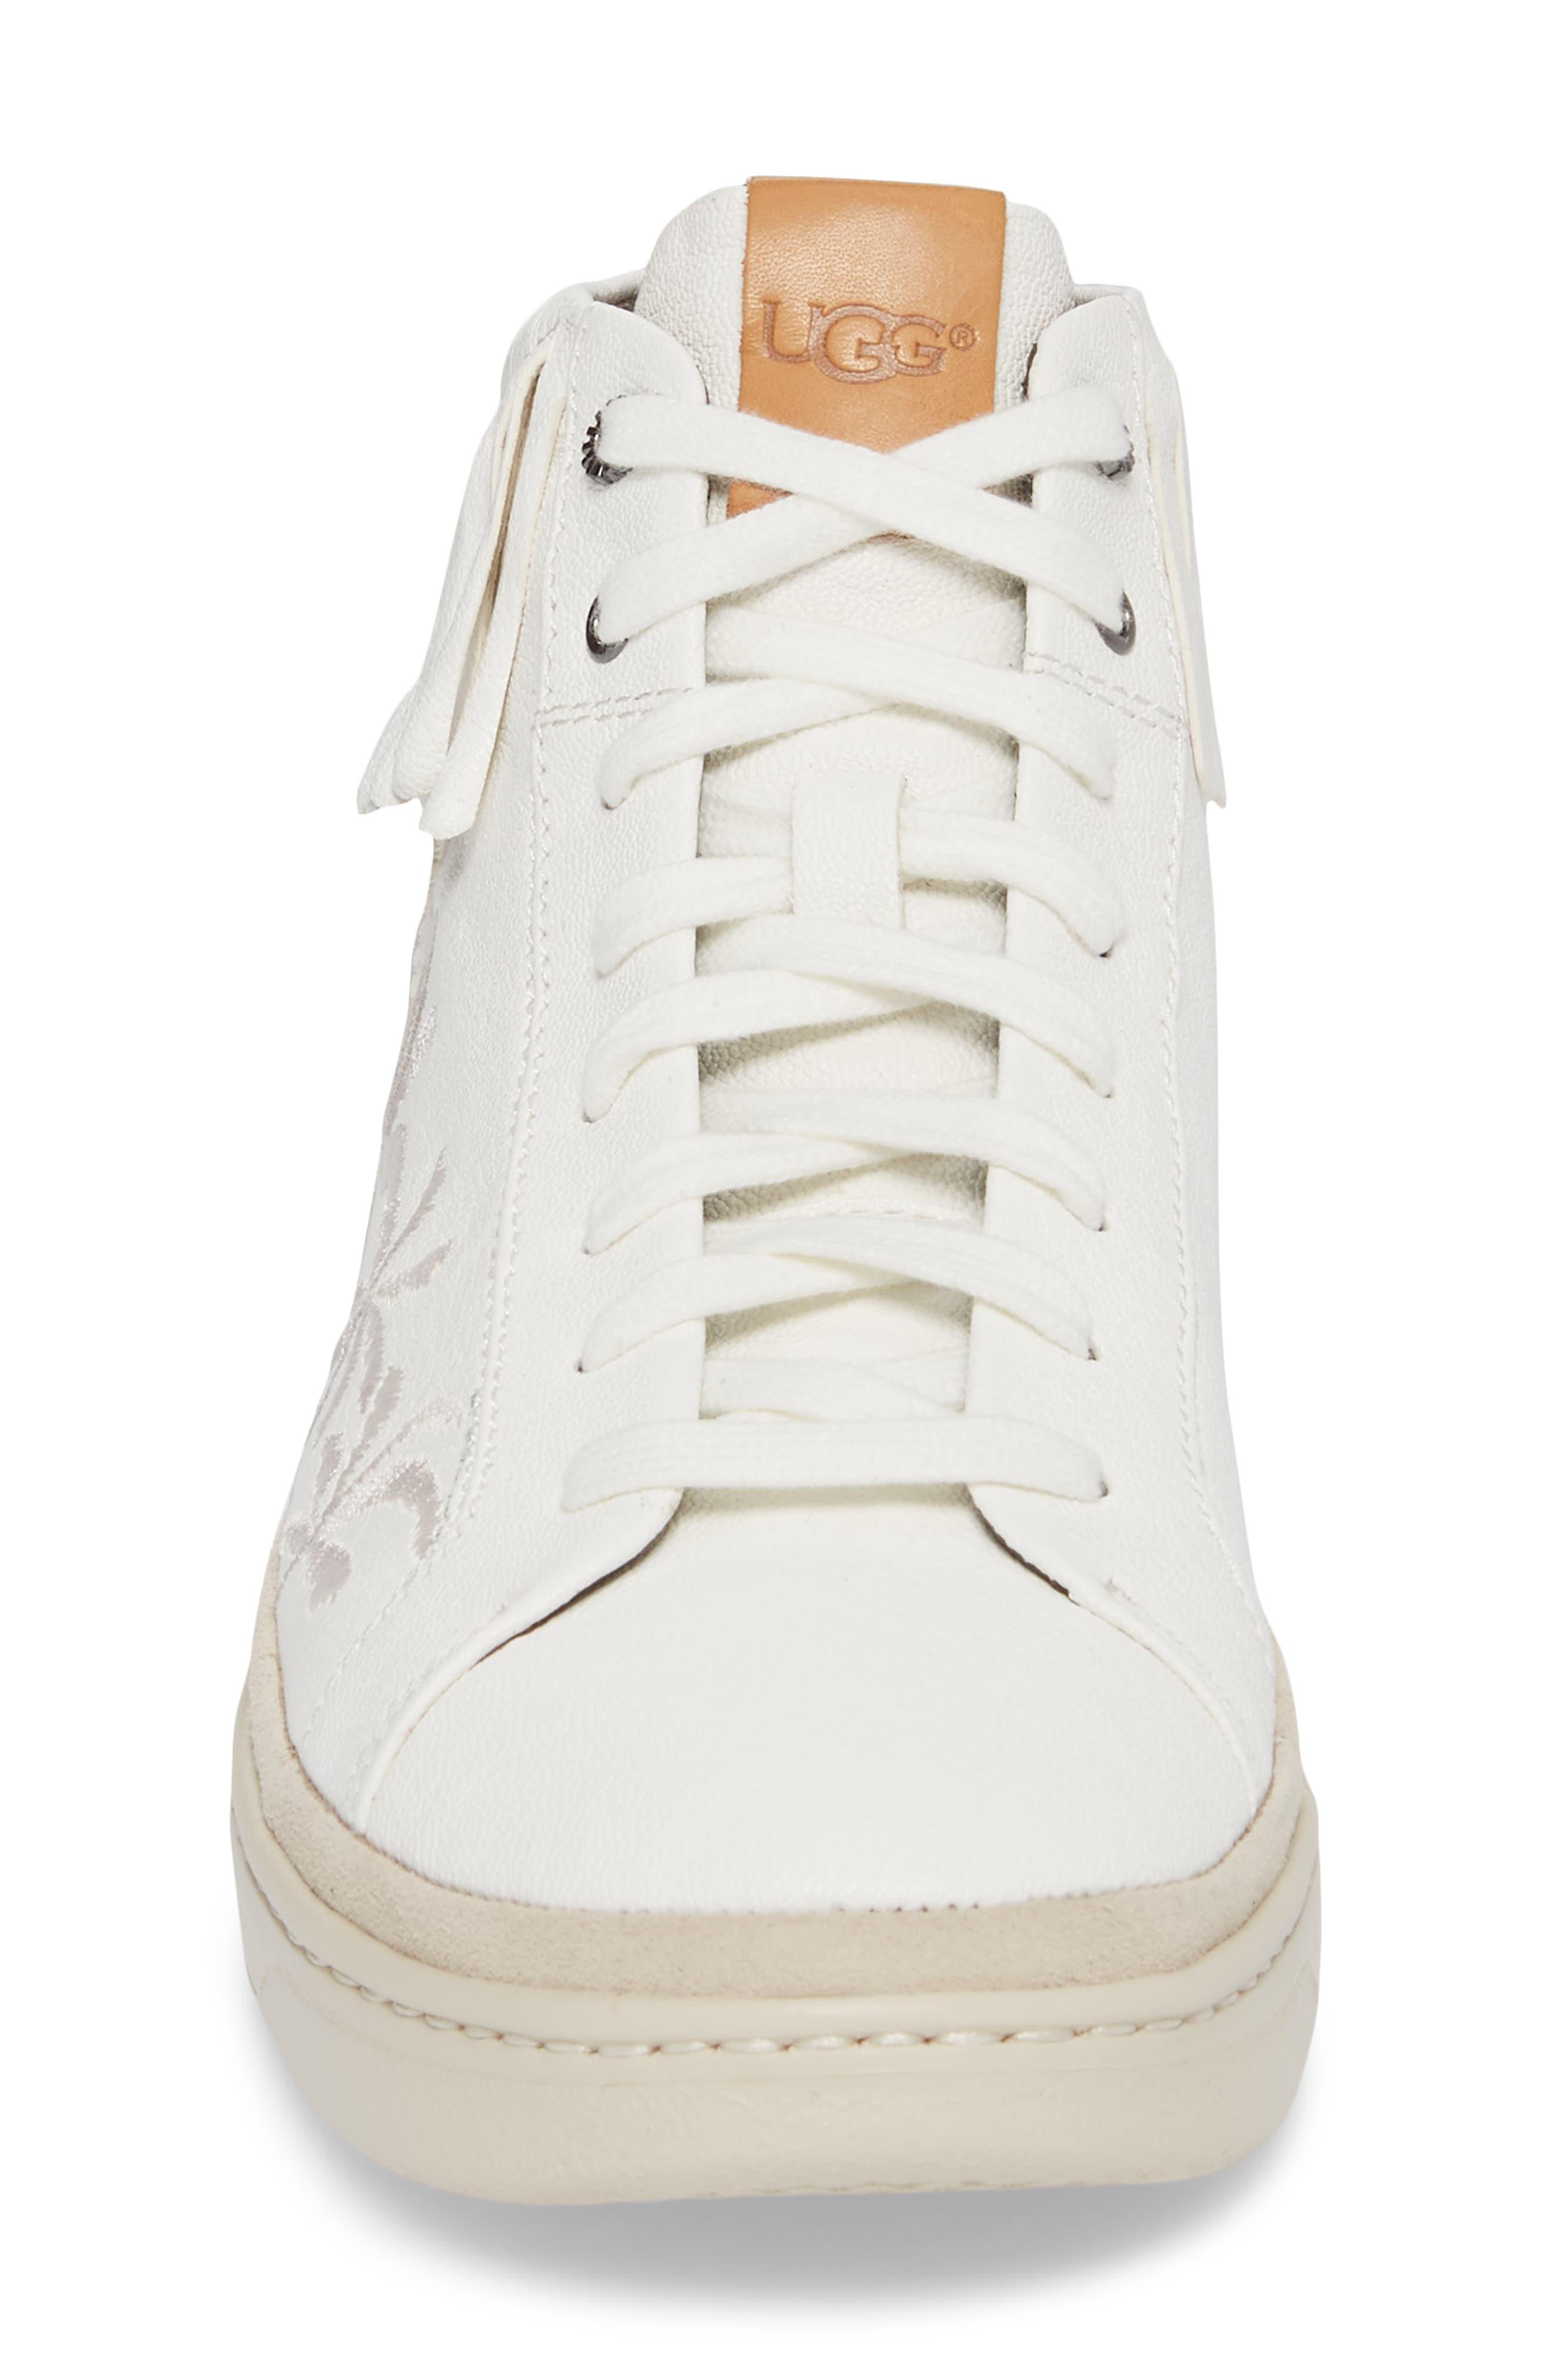 Cali Fringe High Top Sneaker,                             Alternate thumbnail 4, color,                             White Leather